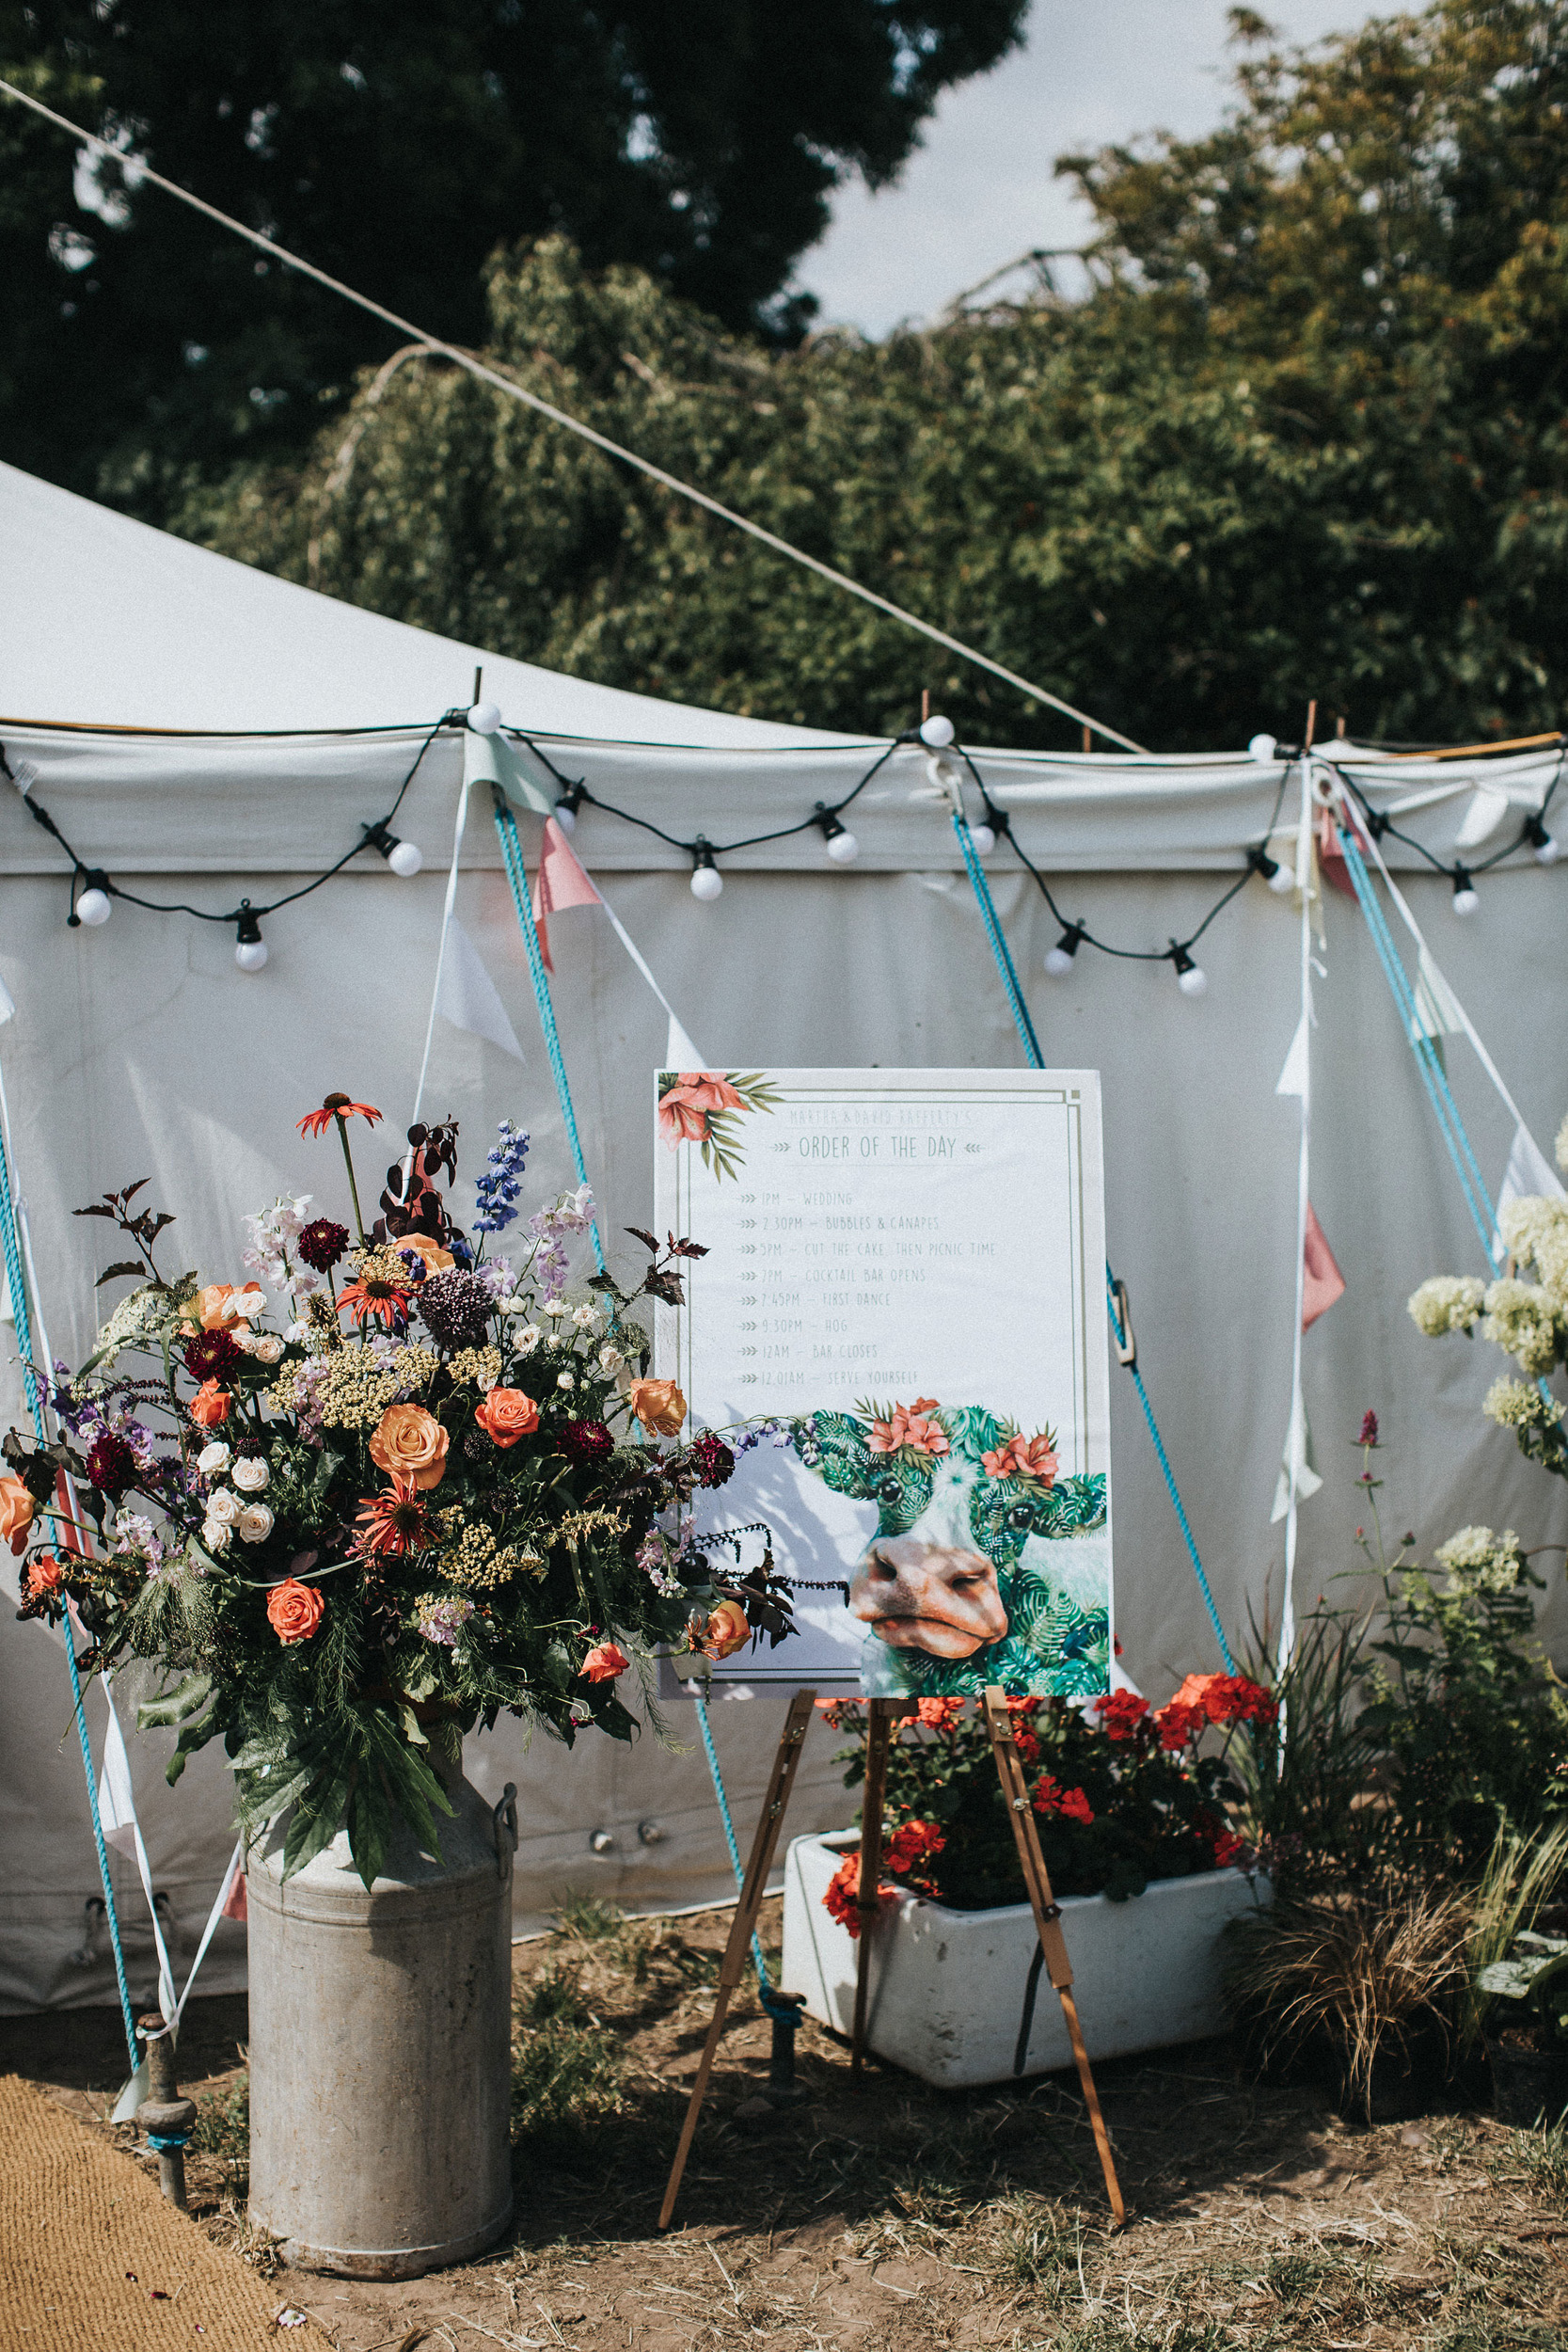 Martha-Laid-Back-Garden-Wedding-Lace-Wedding-Dress-Bohemian-Kate-Beaumont-40.jpg